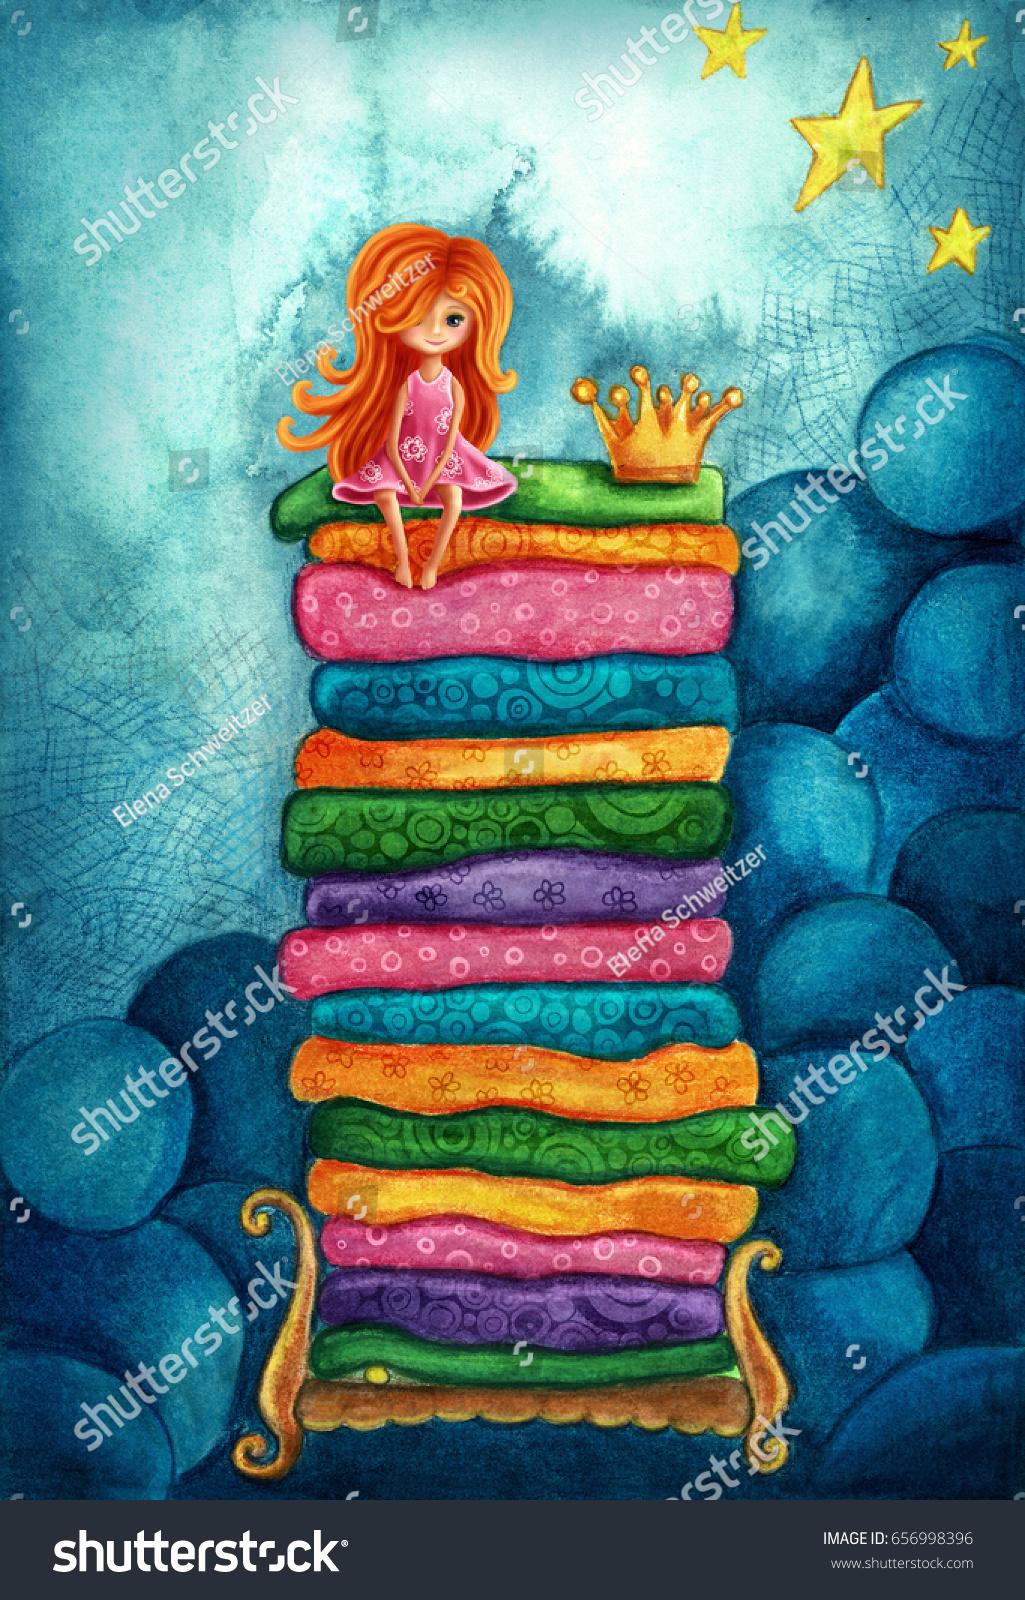 princess and the pea illustration. the princess and pea. illustration pea h